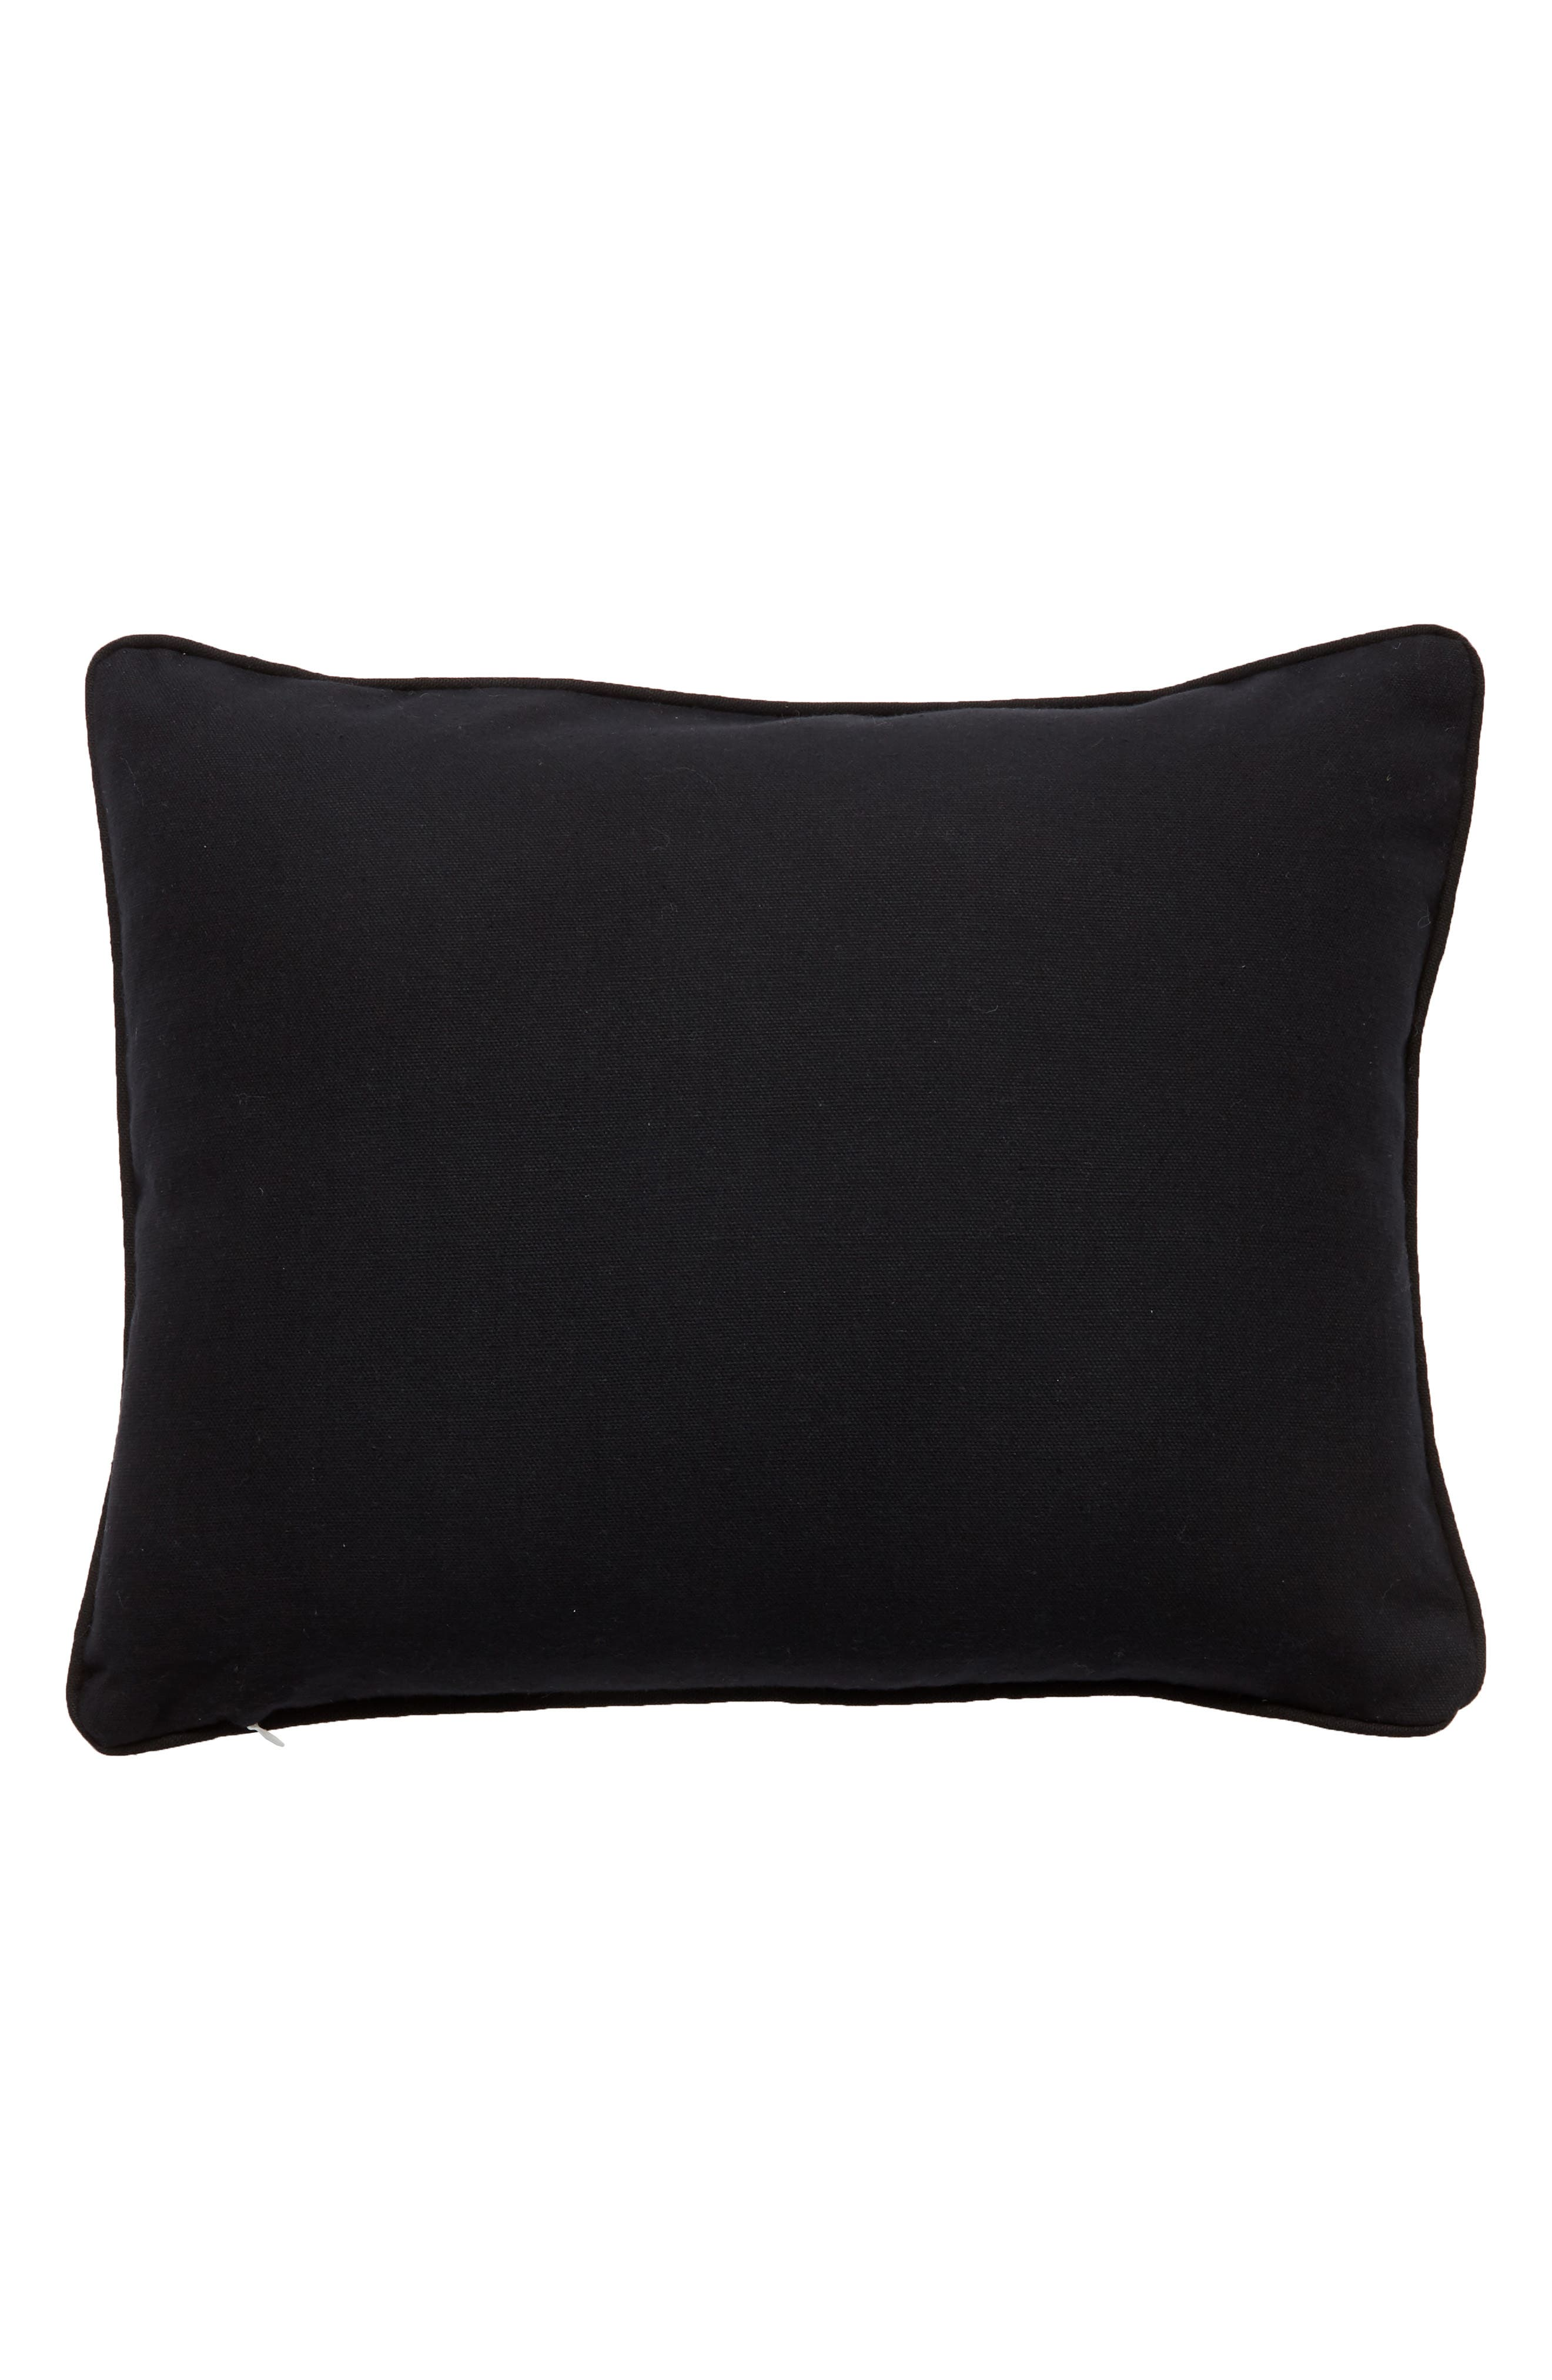 Ask Dad Accent Pillow,                             Alternate thumbnail 2, color,                             250